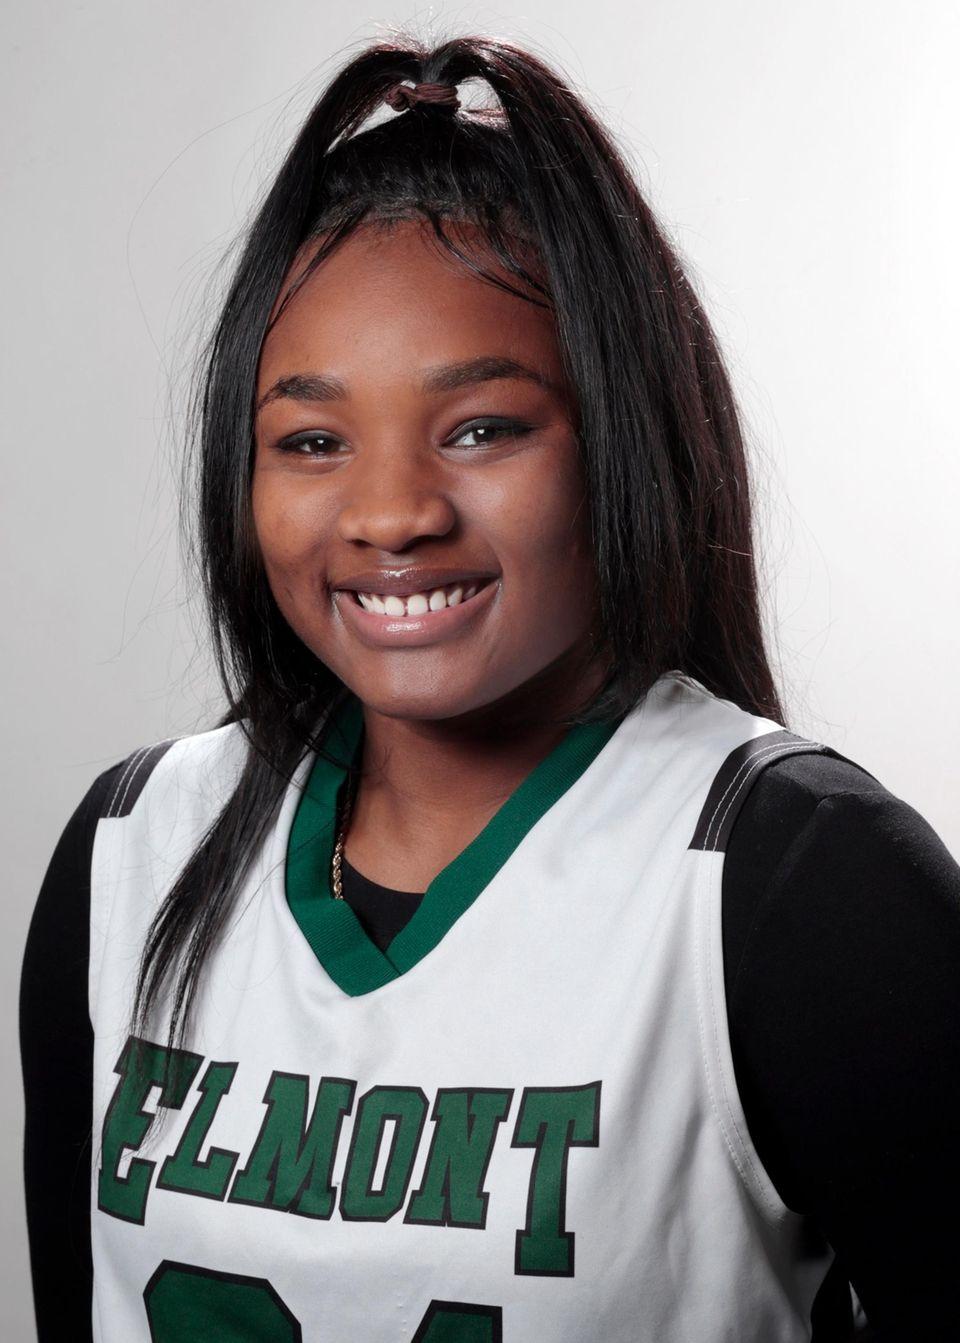 She led the team in scoring and rebounding